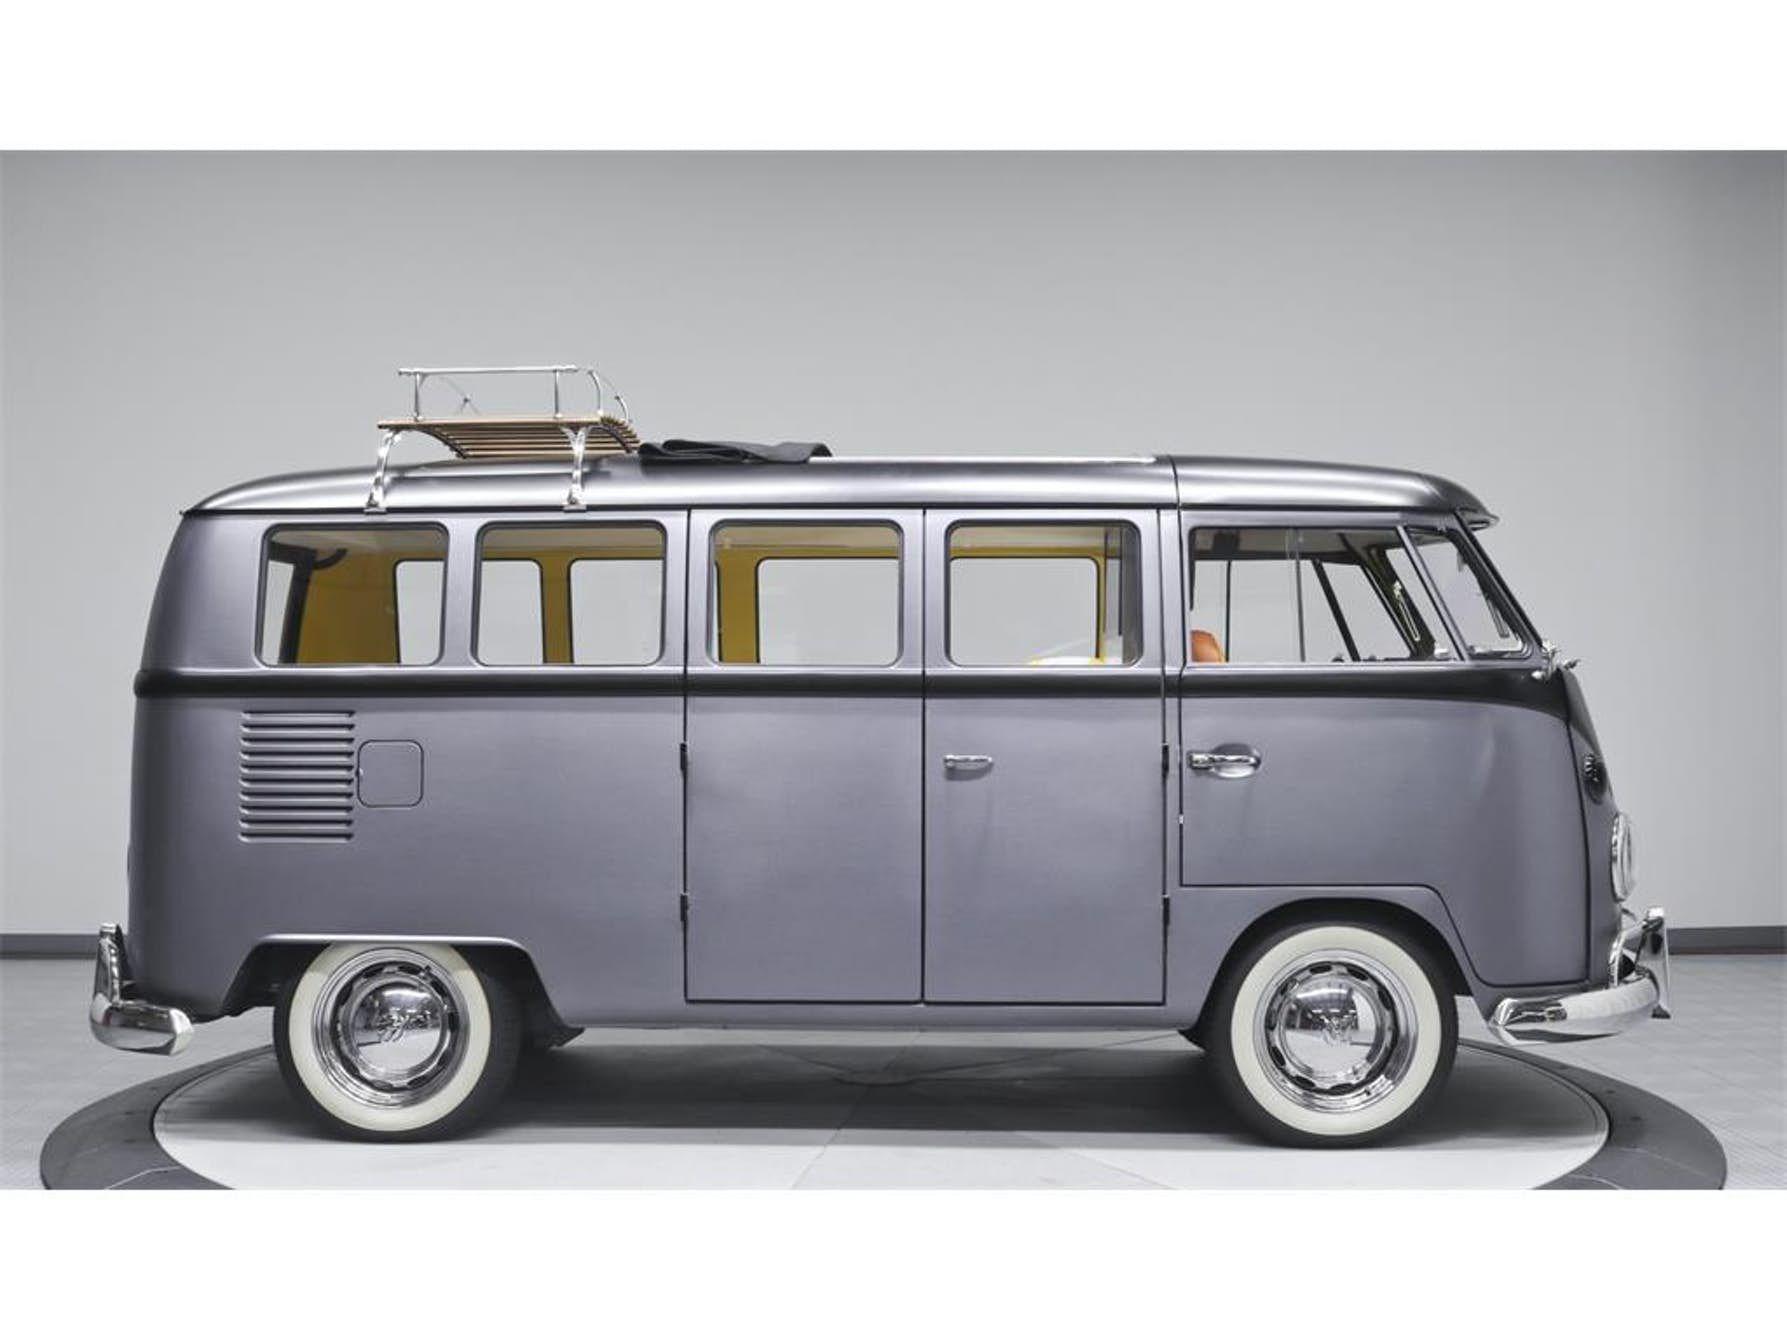 It S A Sleek Restoration But Still At 1967 Kombi At Heart Vintage Vw Bus Vw Bus Volkswagen Bus